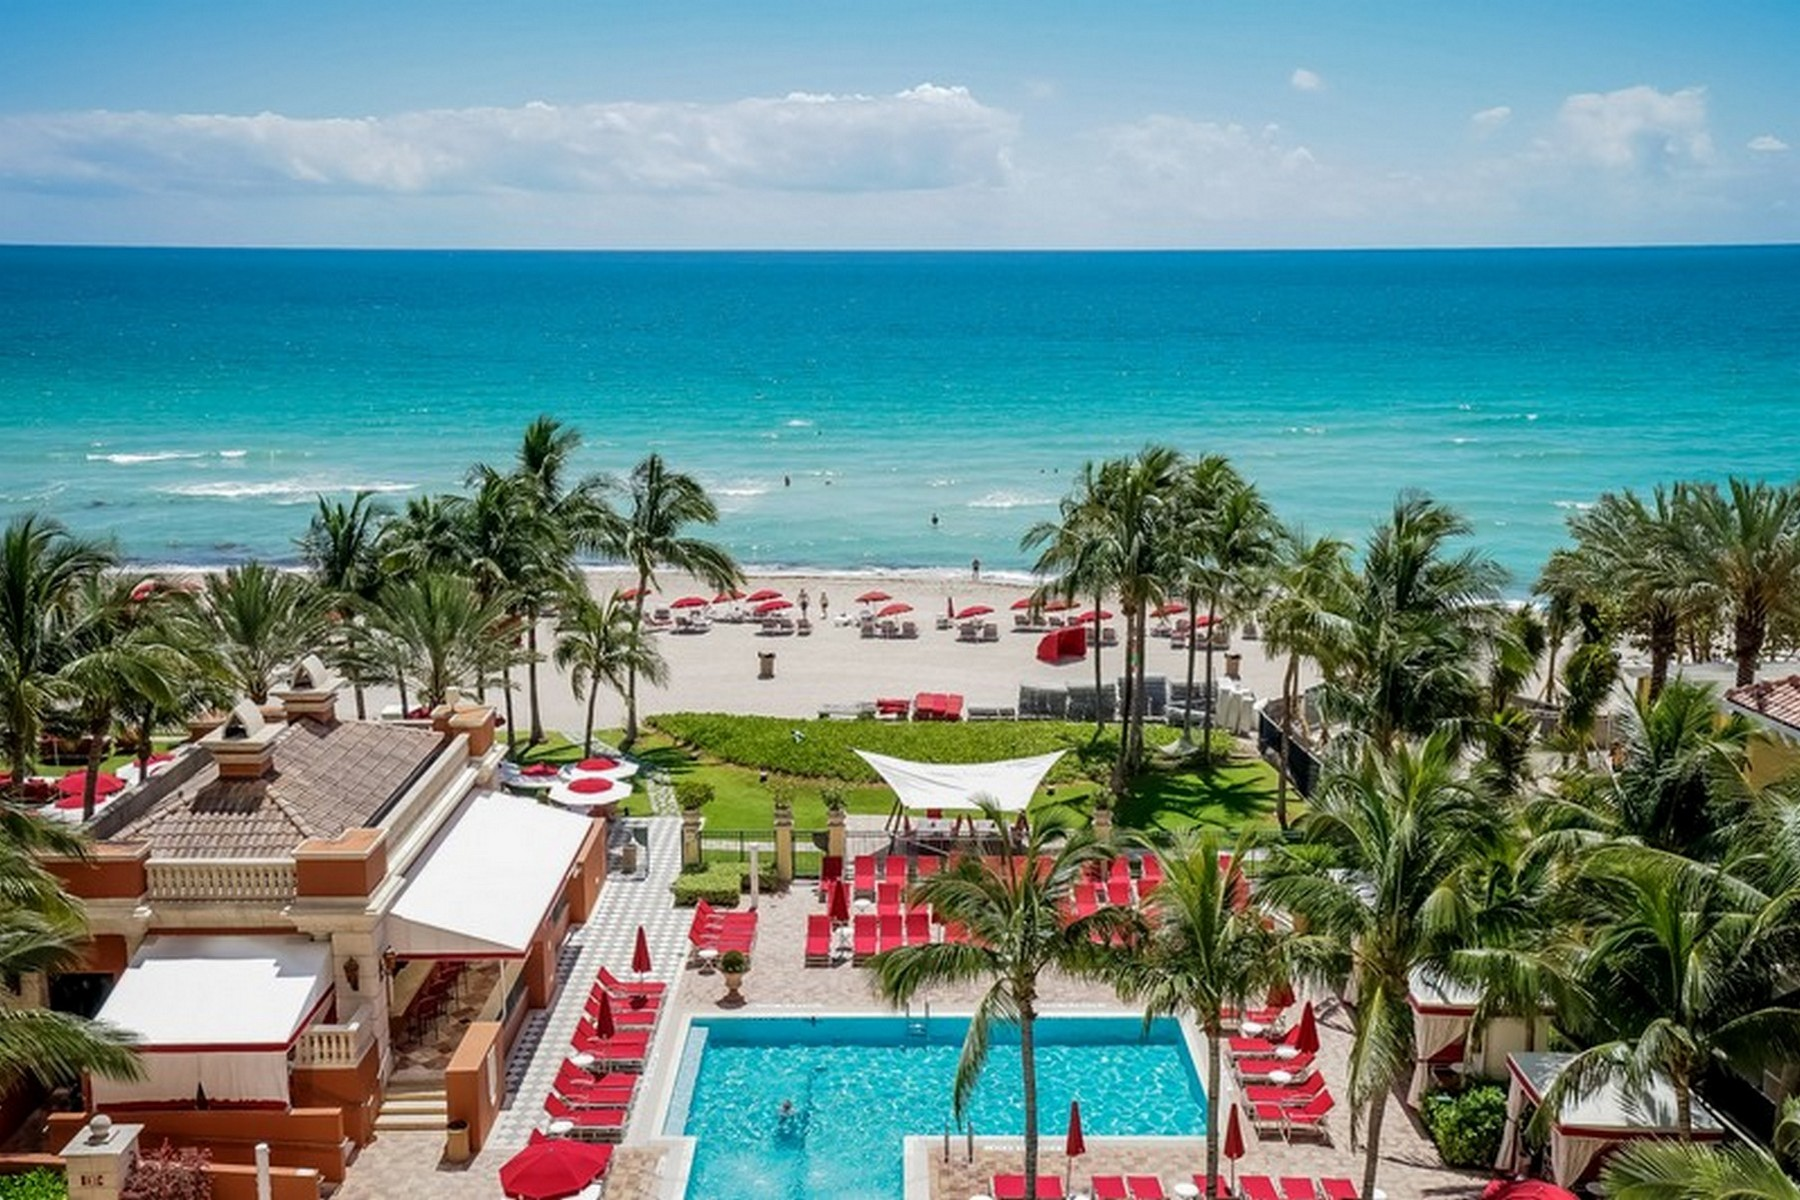 Condominium for Sale at 17875 Collins Ave #706 17875 Collins Av 706 Sunny Isles Beach, Florida, 33160 United States